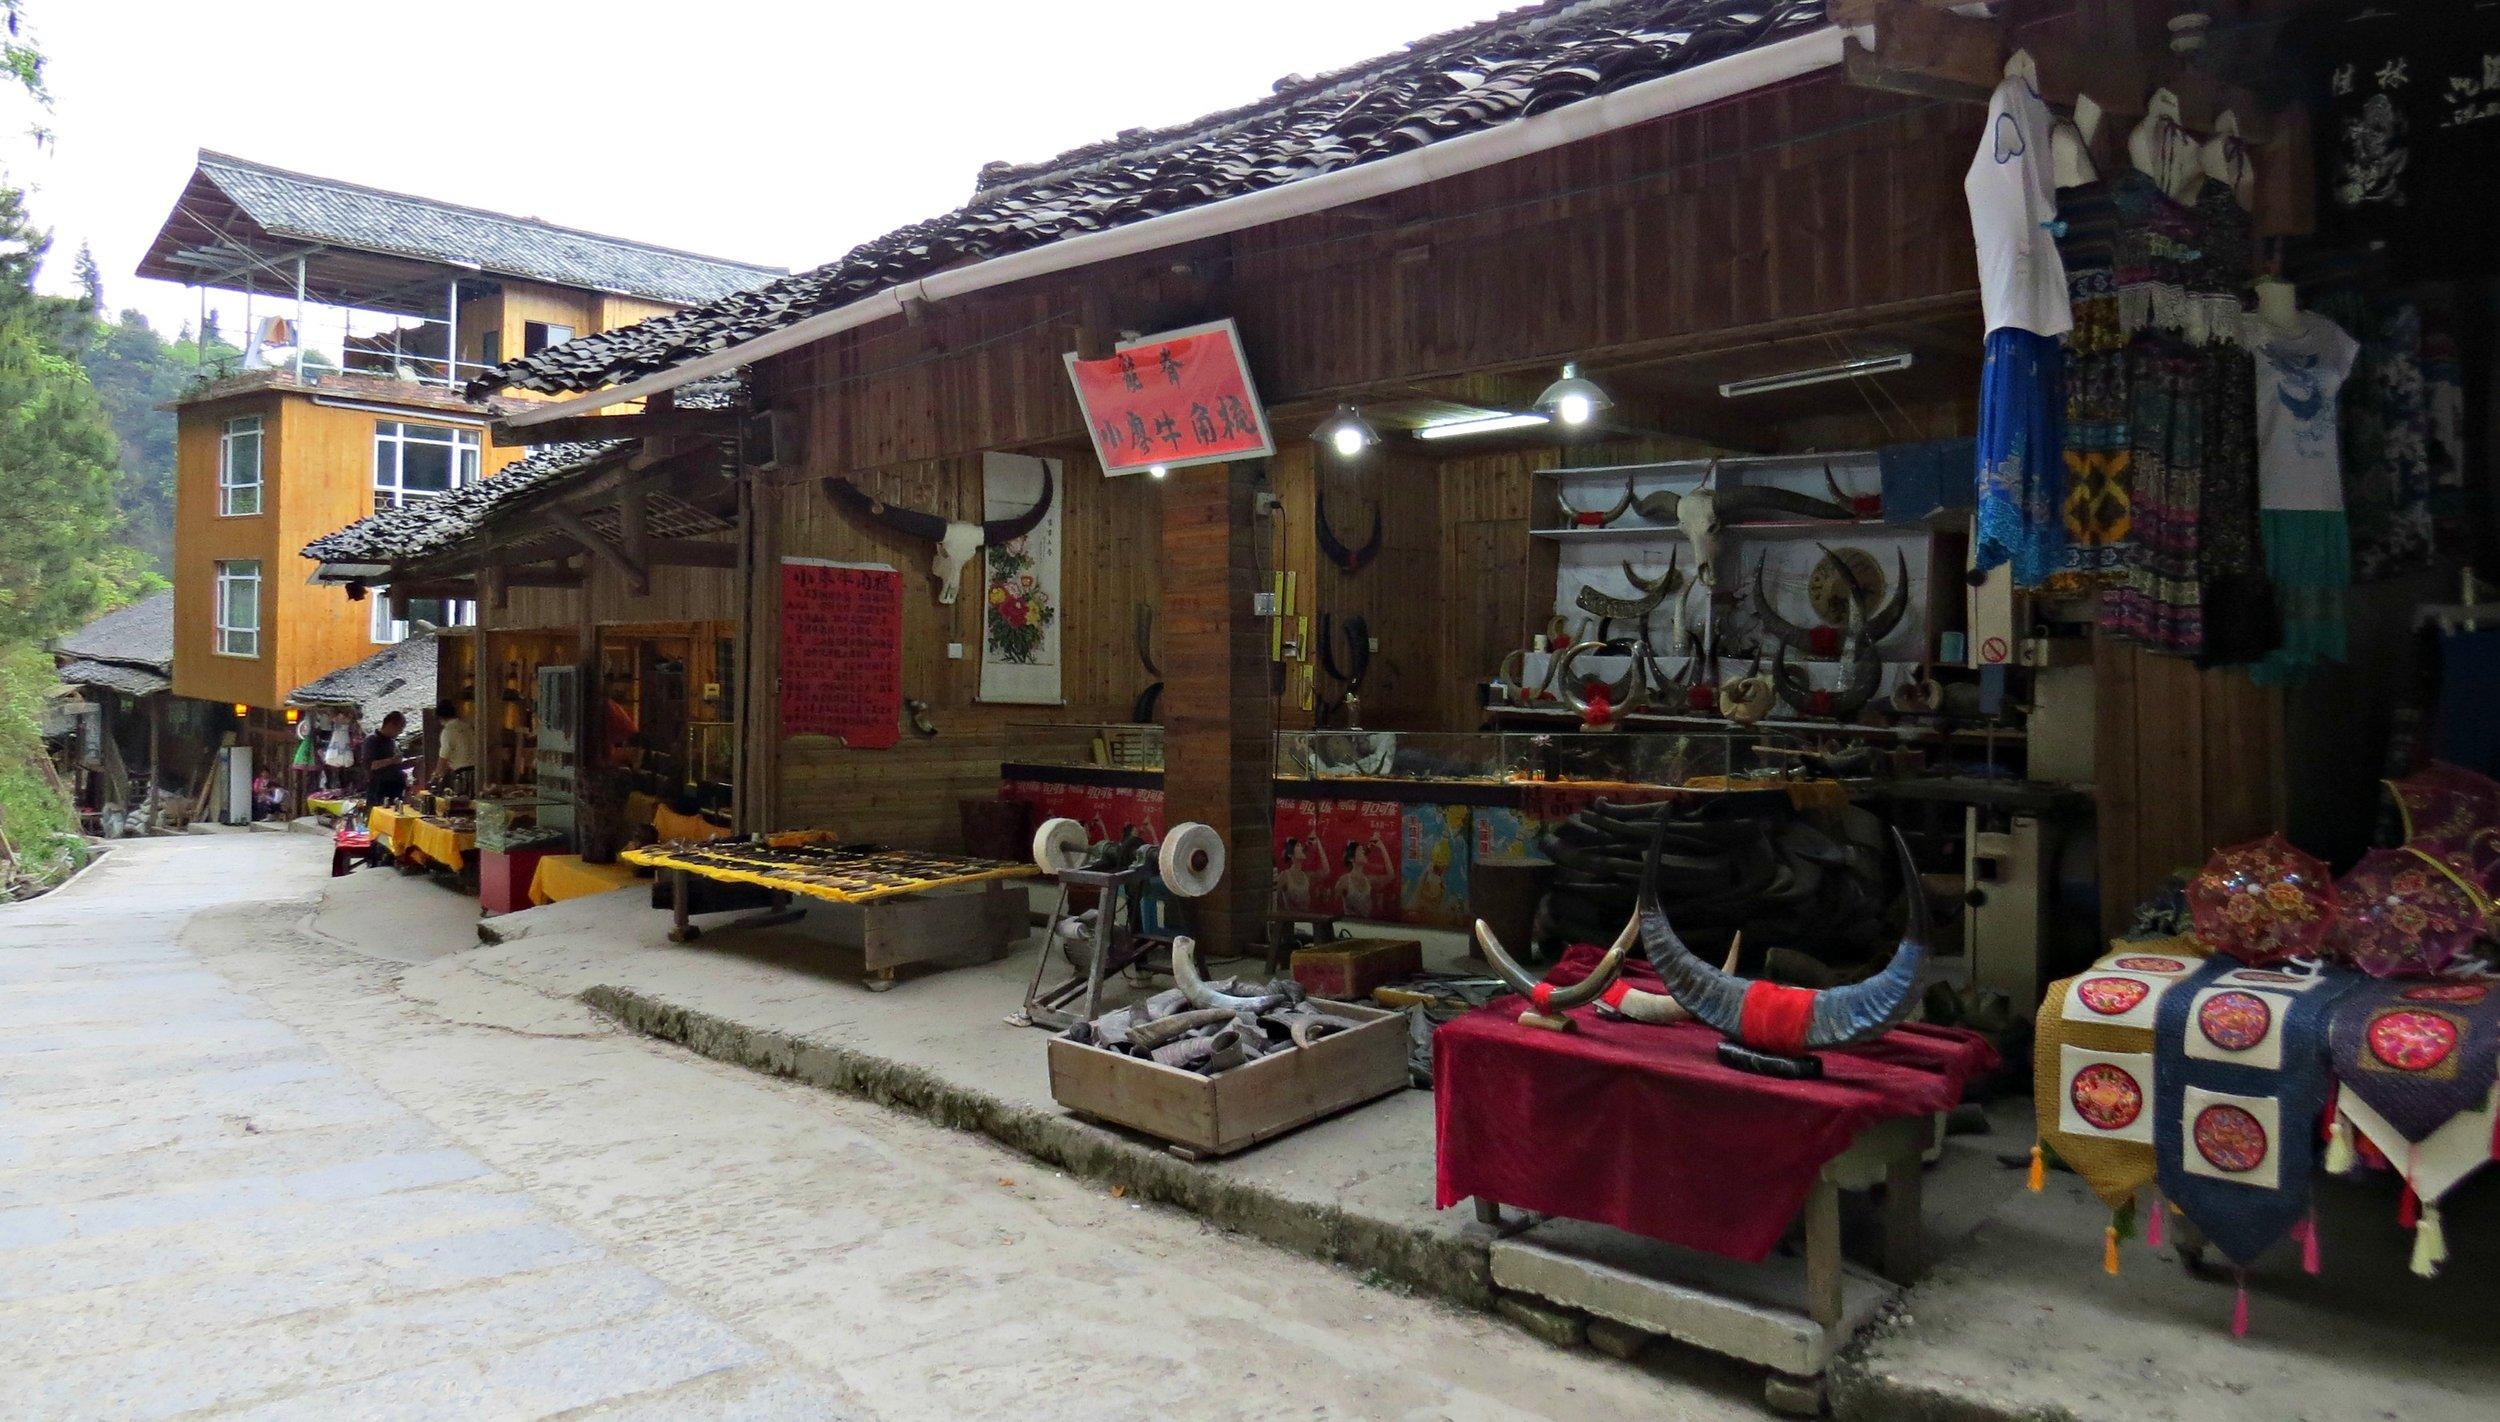 Souvenir Shops and the Baike Hotel